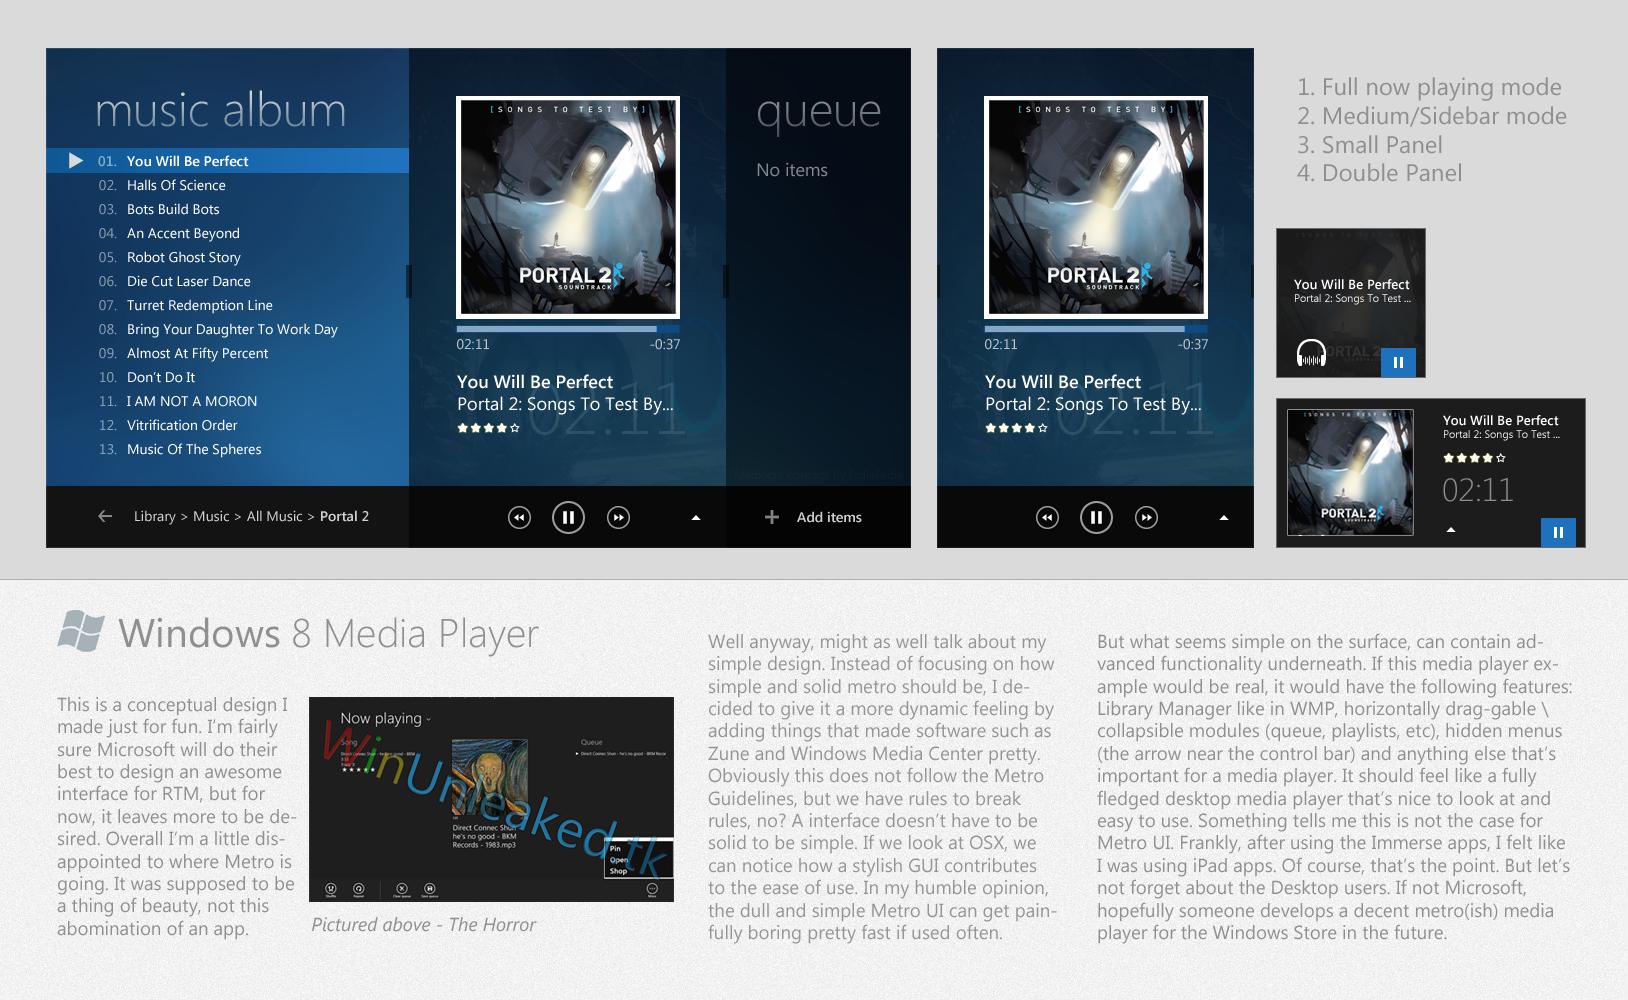 Windows 8 Media Player Concept